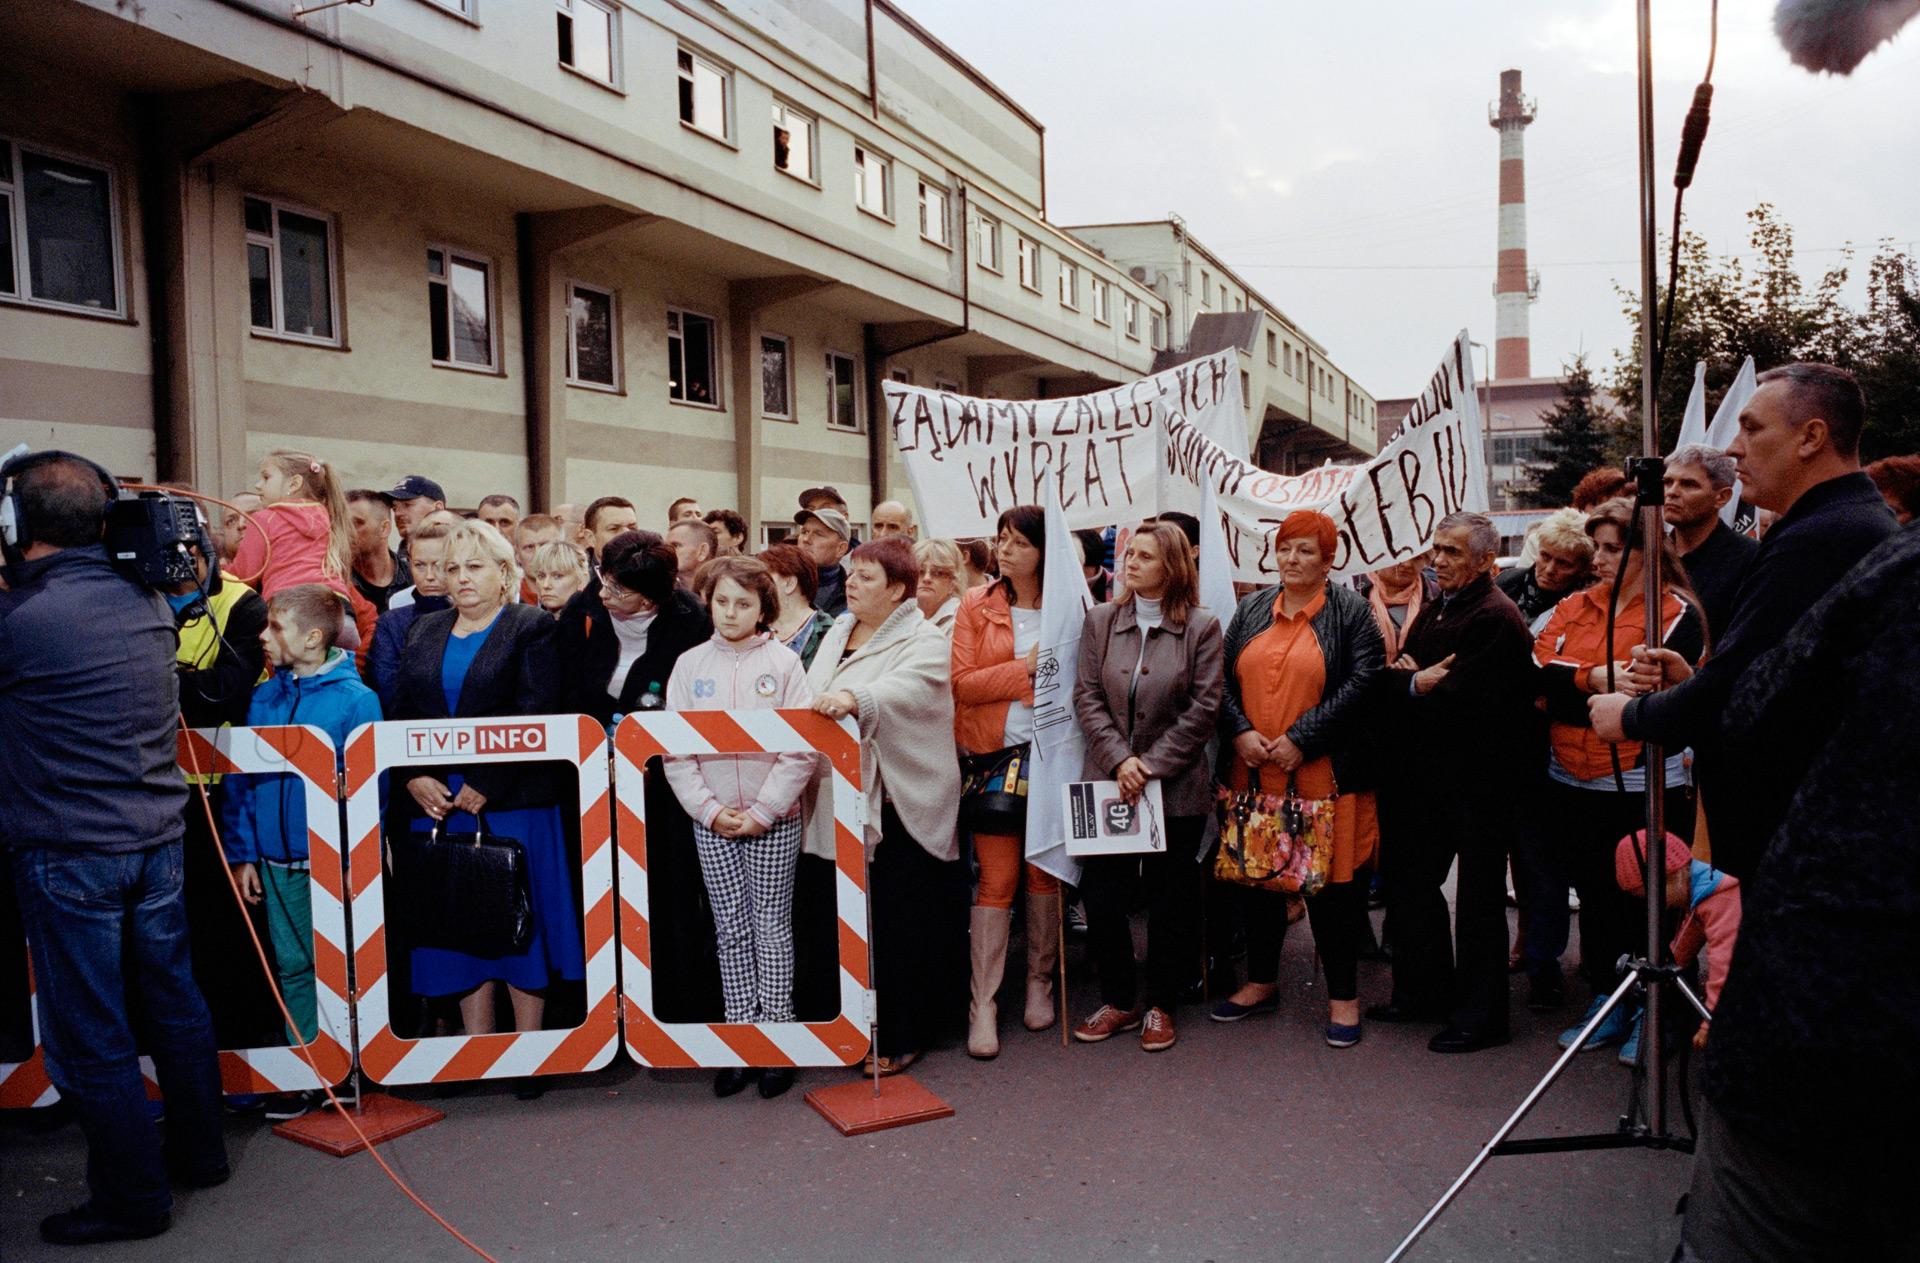 Grève de mineurs à la mine de Węgla Kamiennego Kazimierz Juliusz, Sosnowiec. 2015